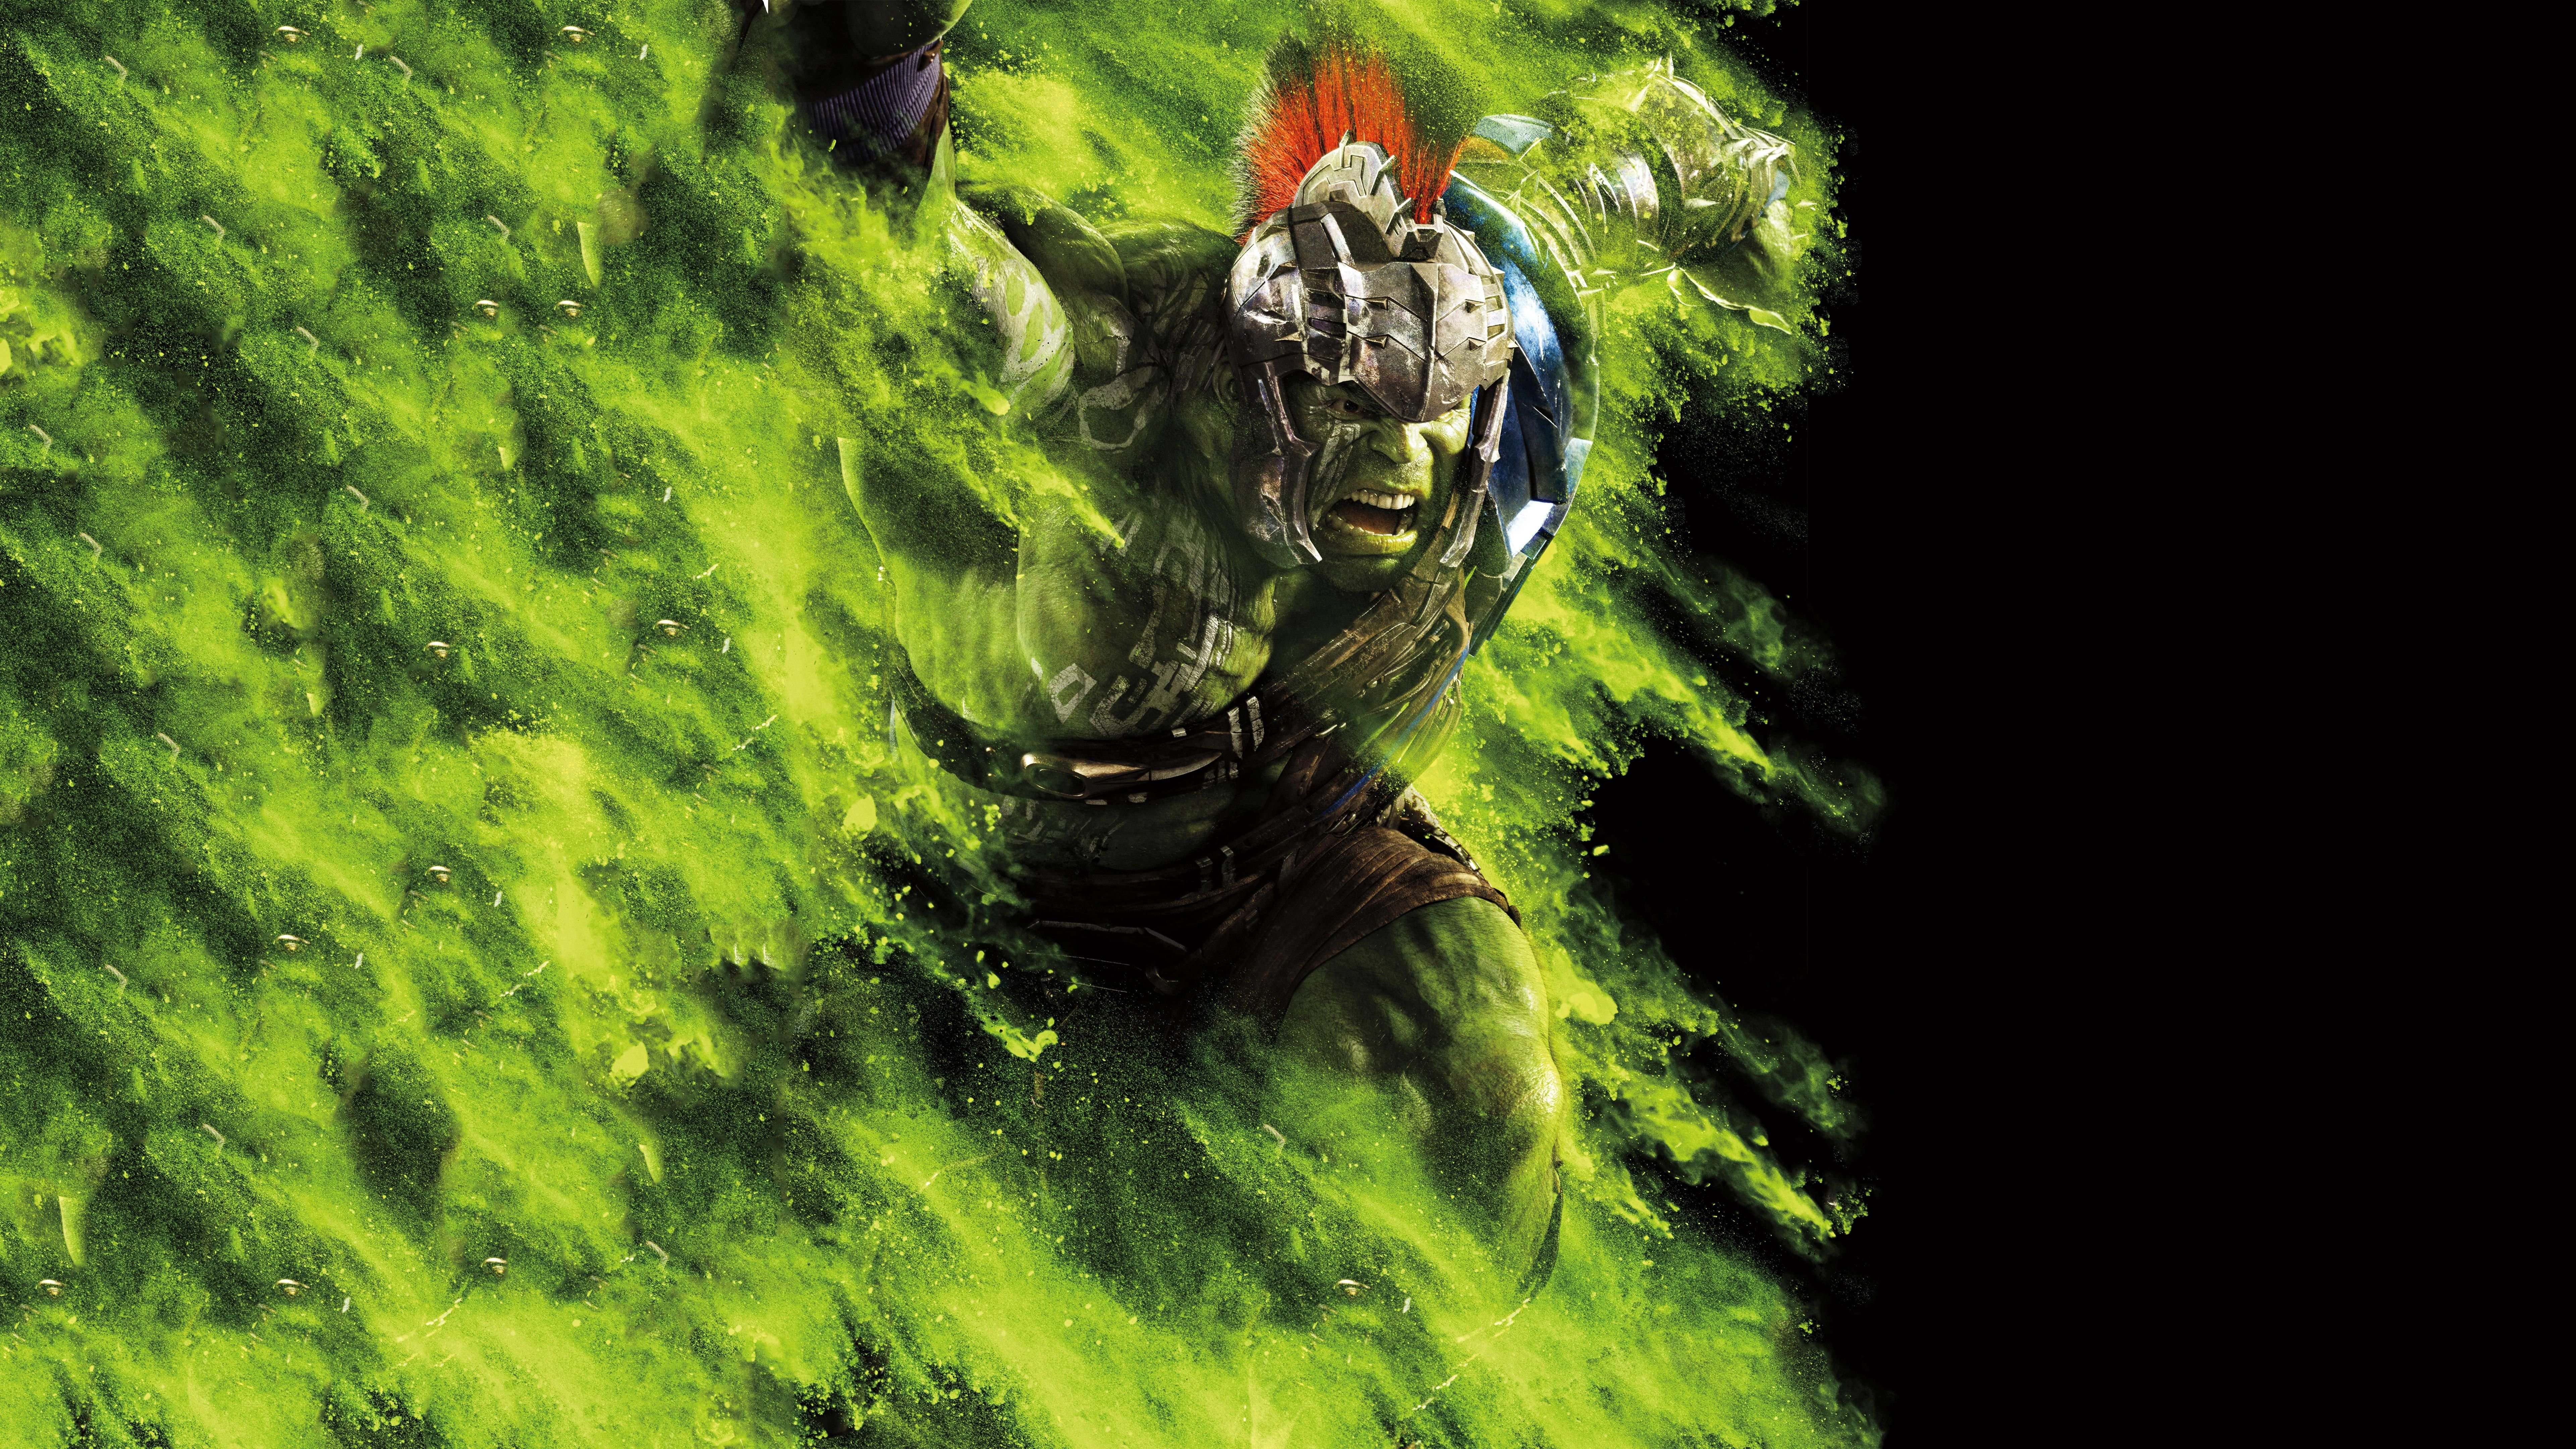 4k Hulk Wallpapers Top Free 4k Hulk Backgrounds Wallpaperaccess